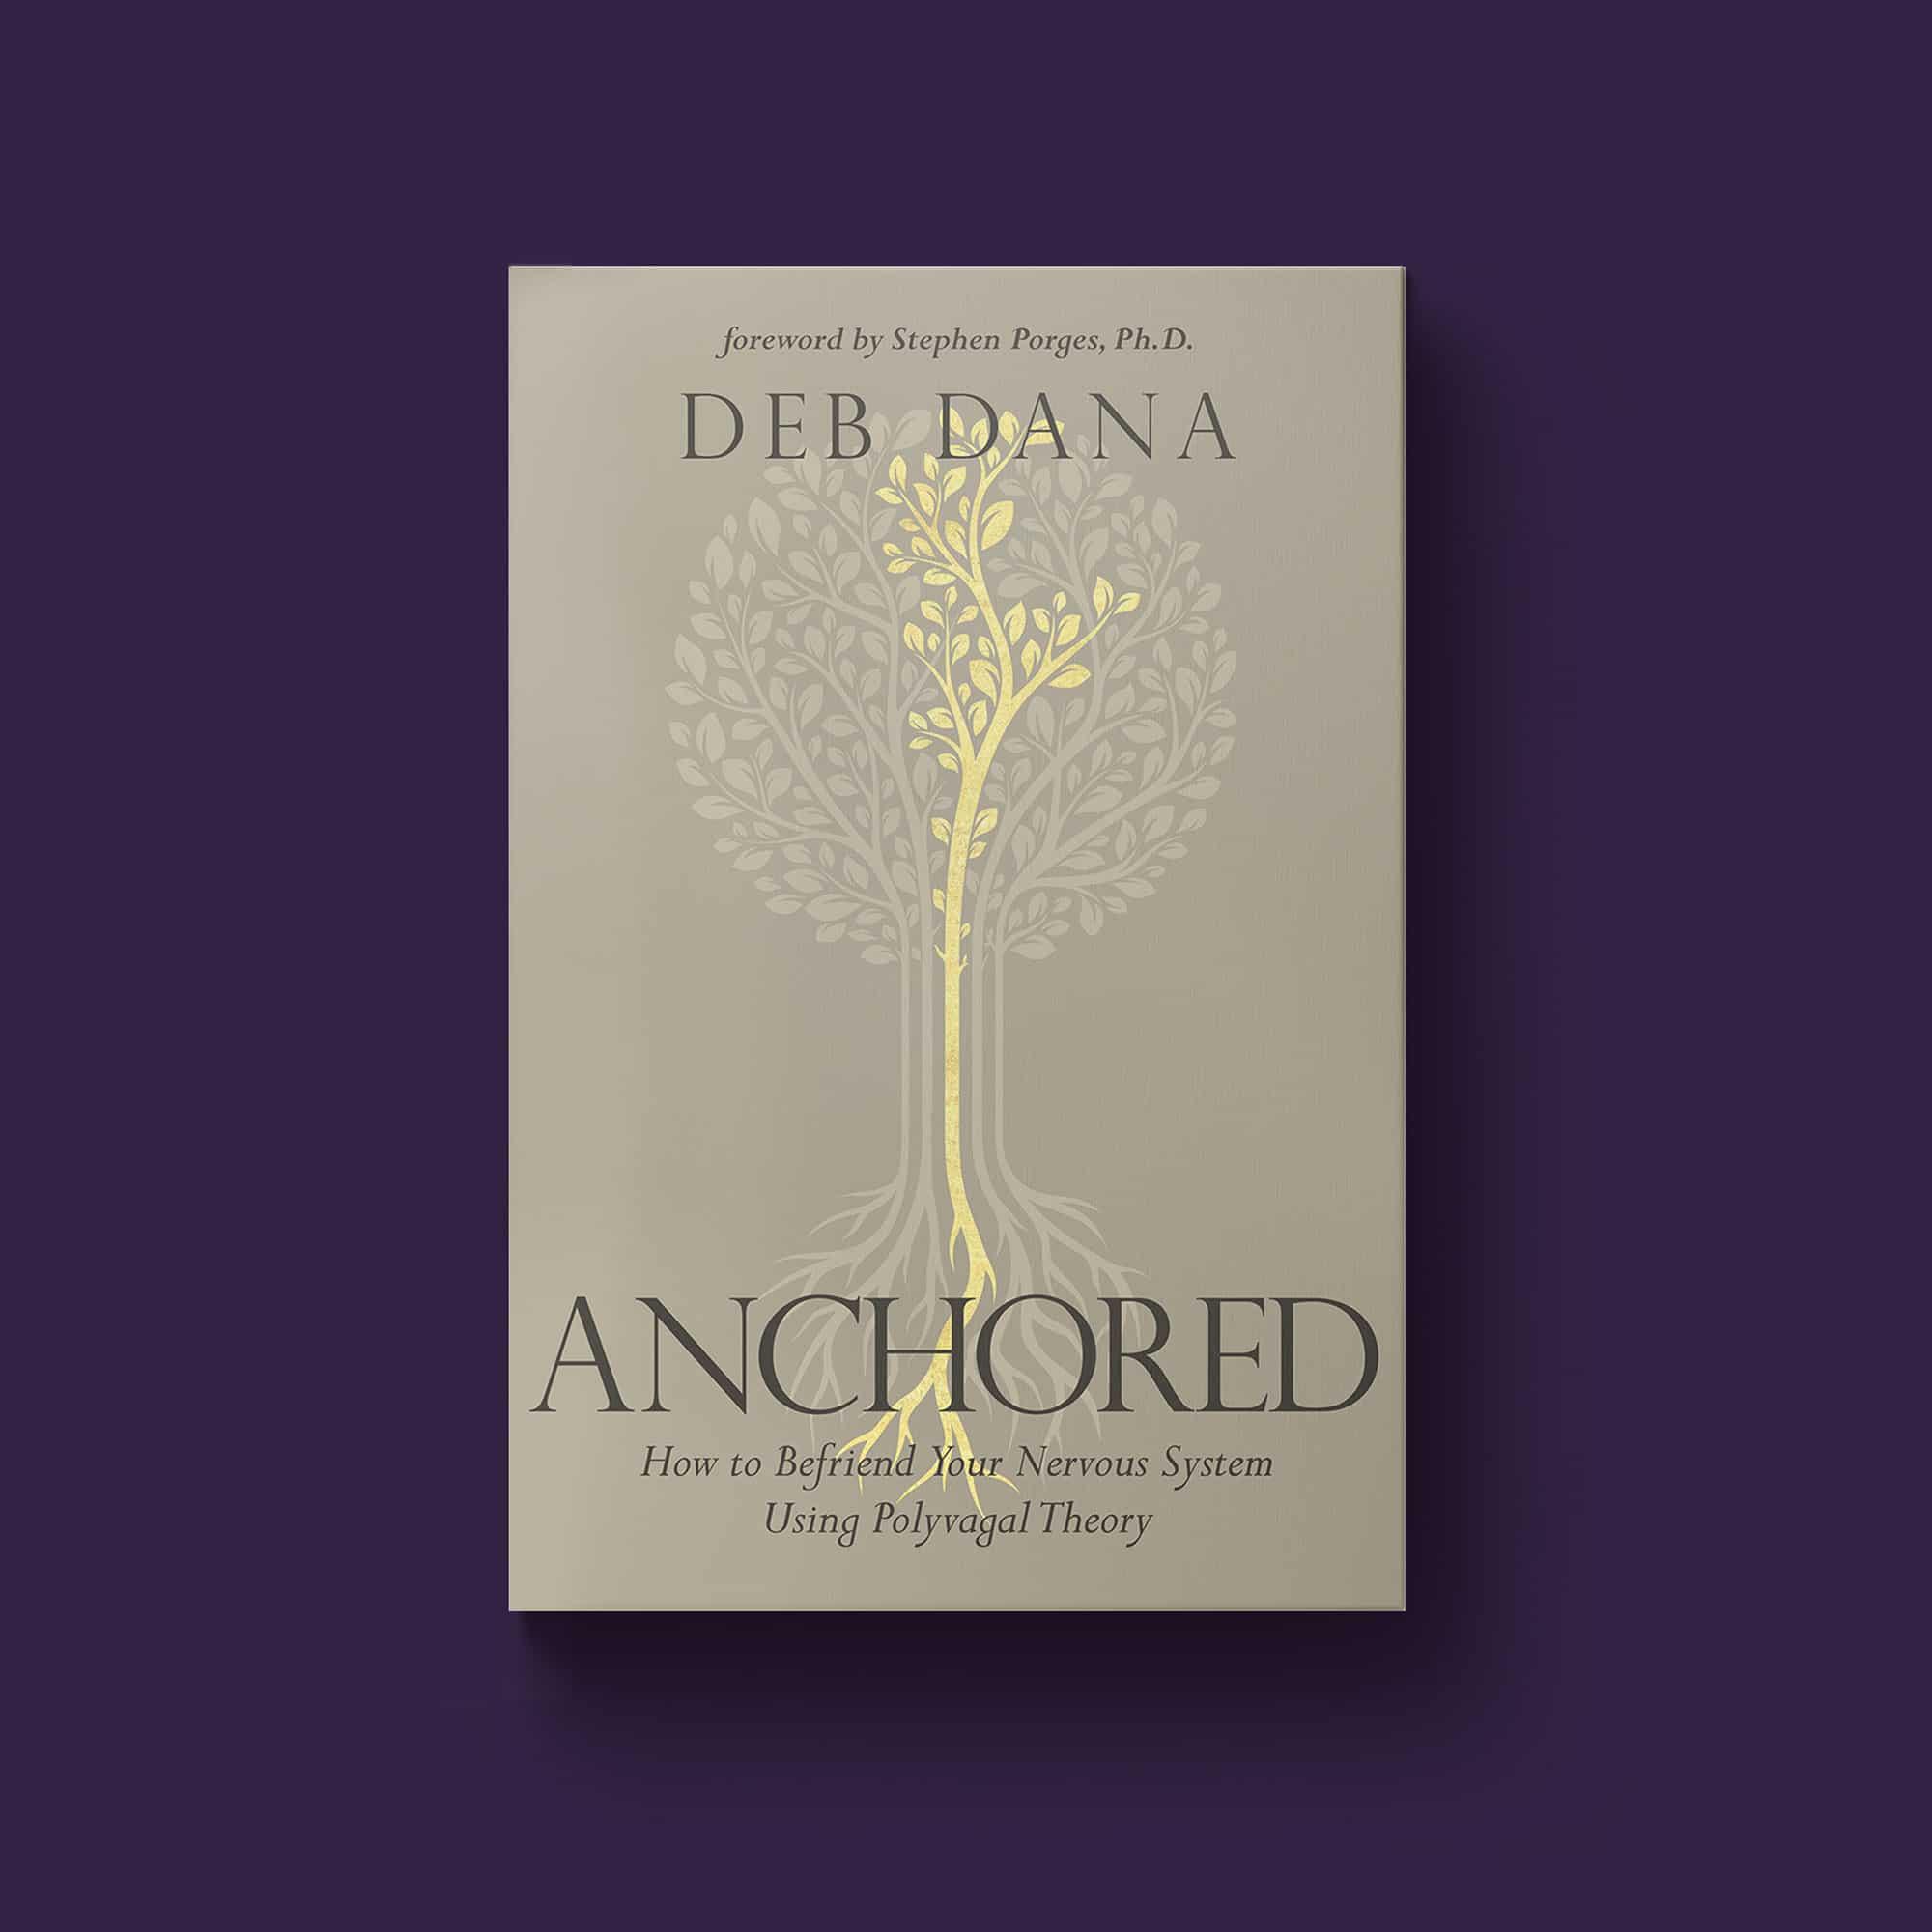 anchored-by-deb-dana